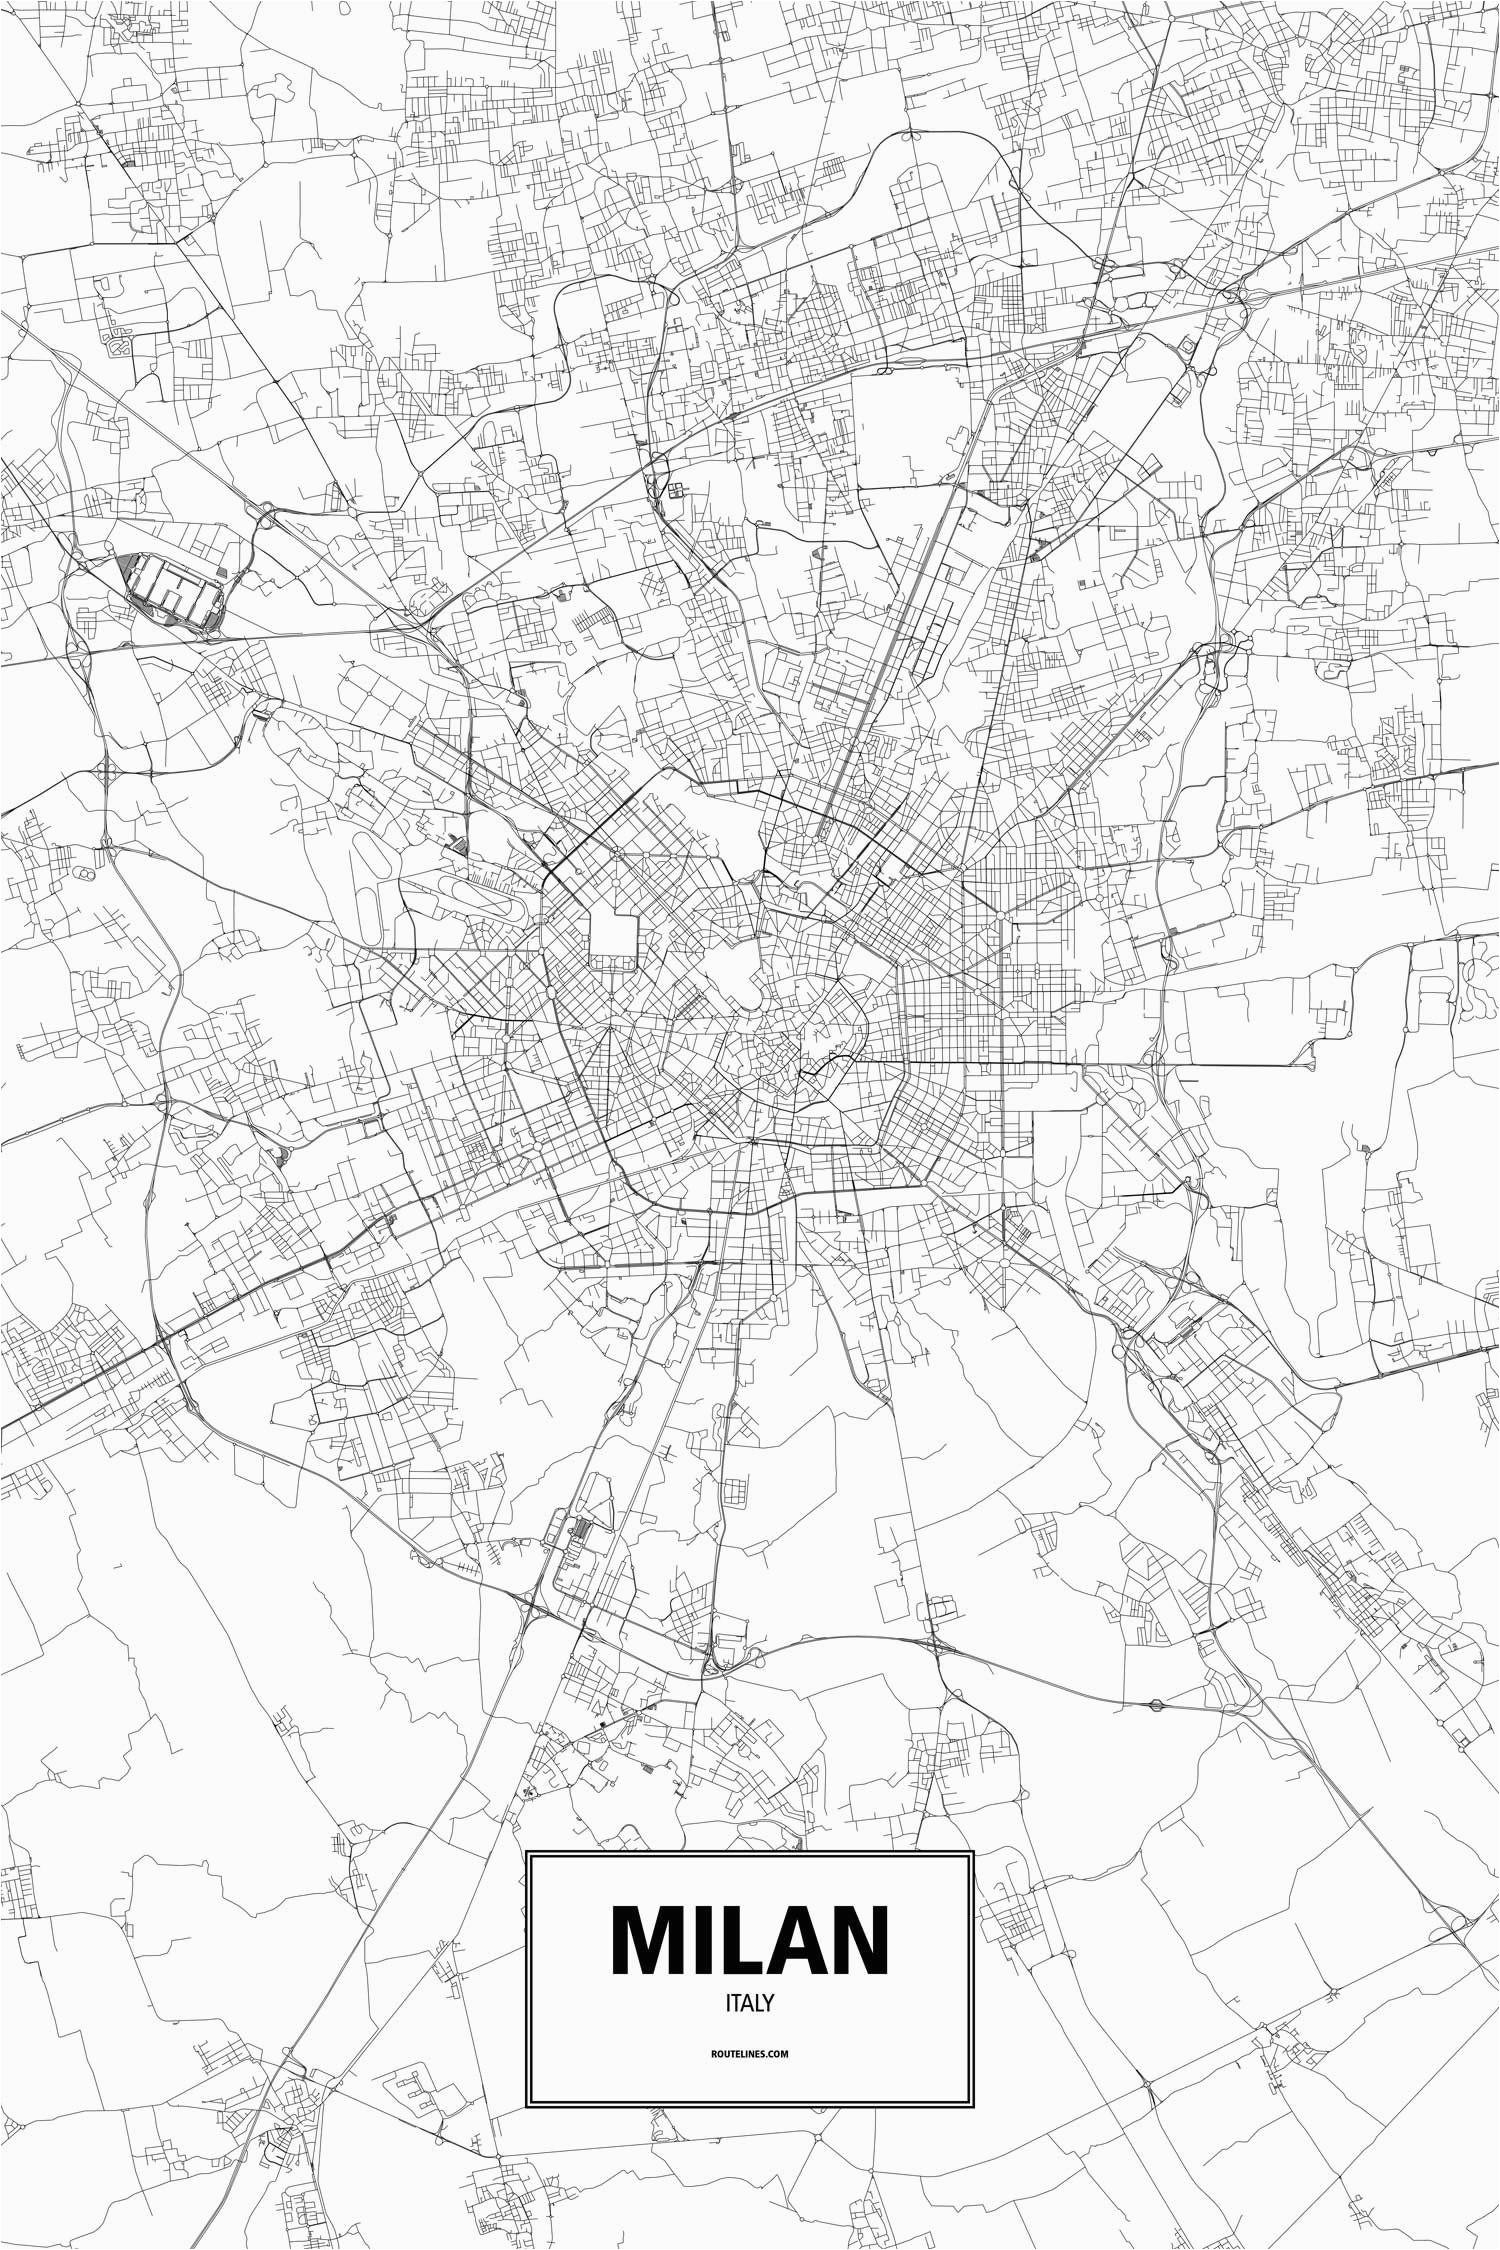 pin by nicolas scarinzi on ideas italy map map wall decor rome map